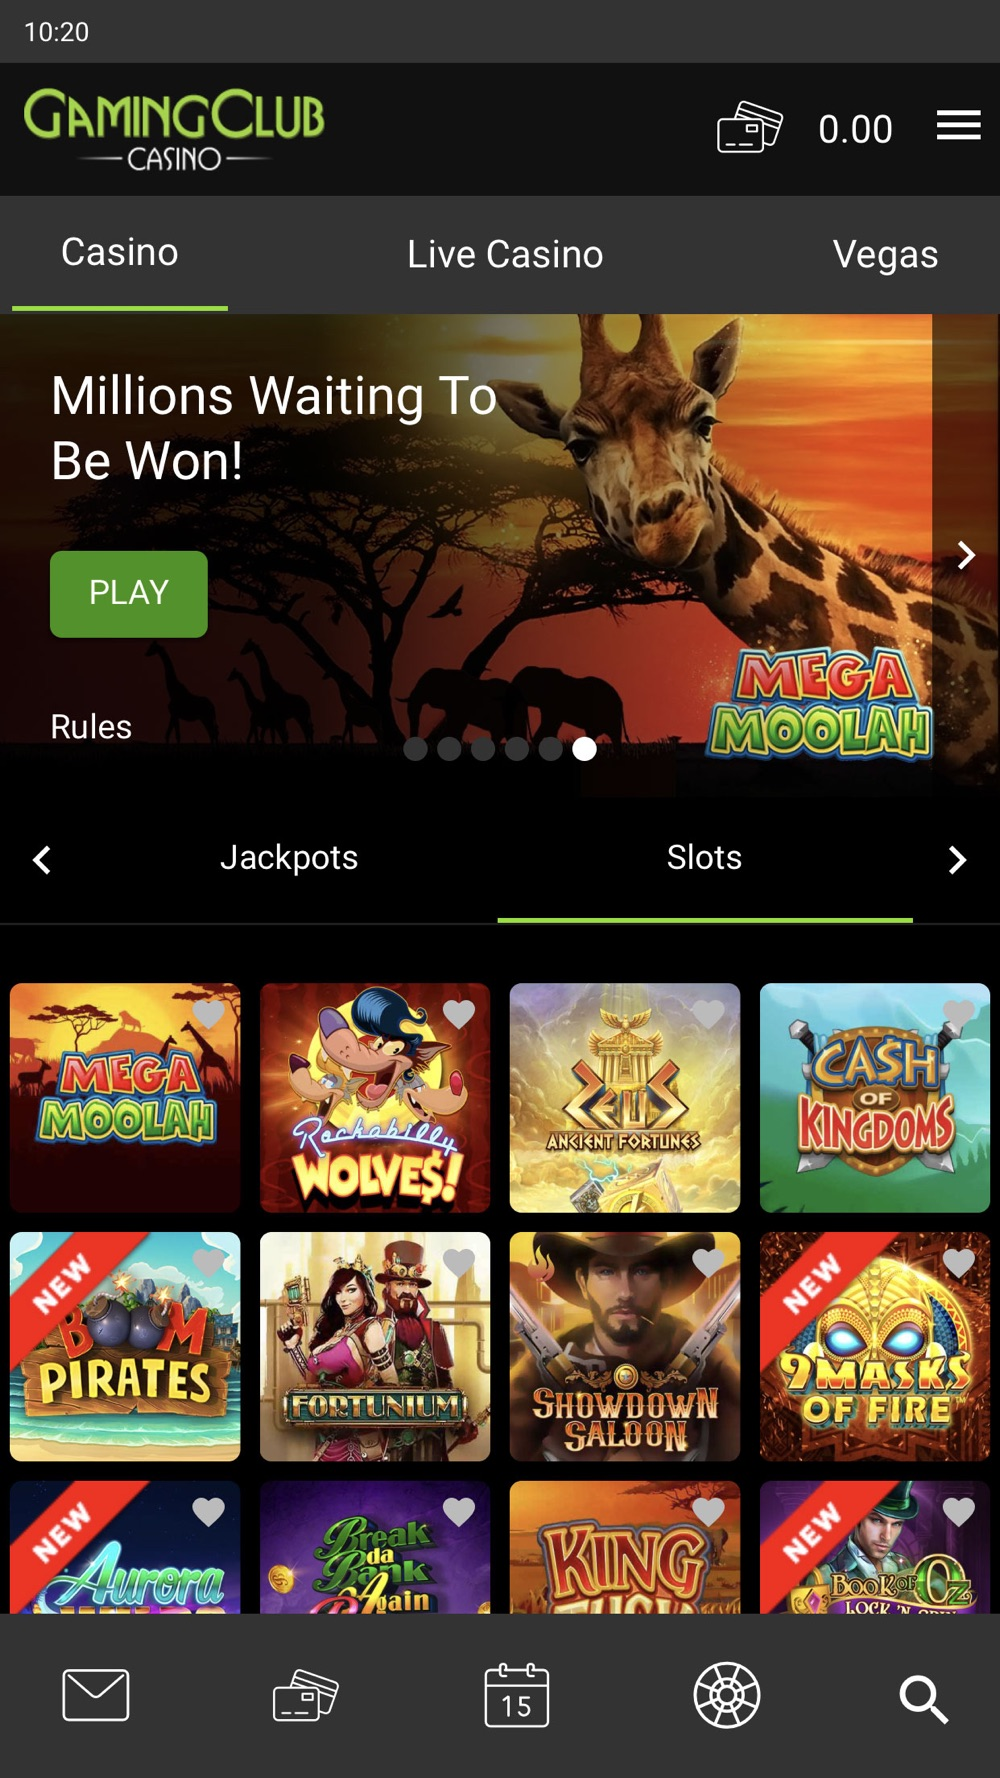 Gamingclub casino 44376